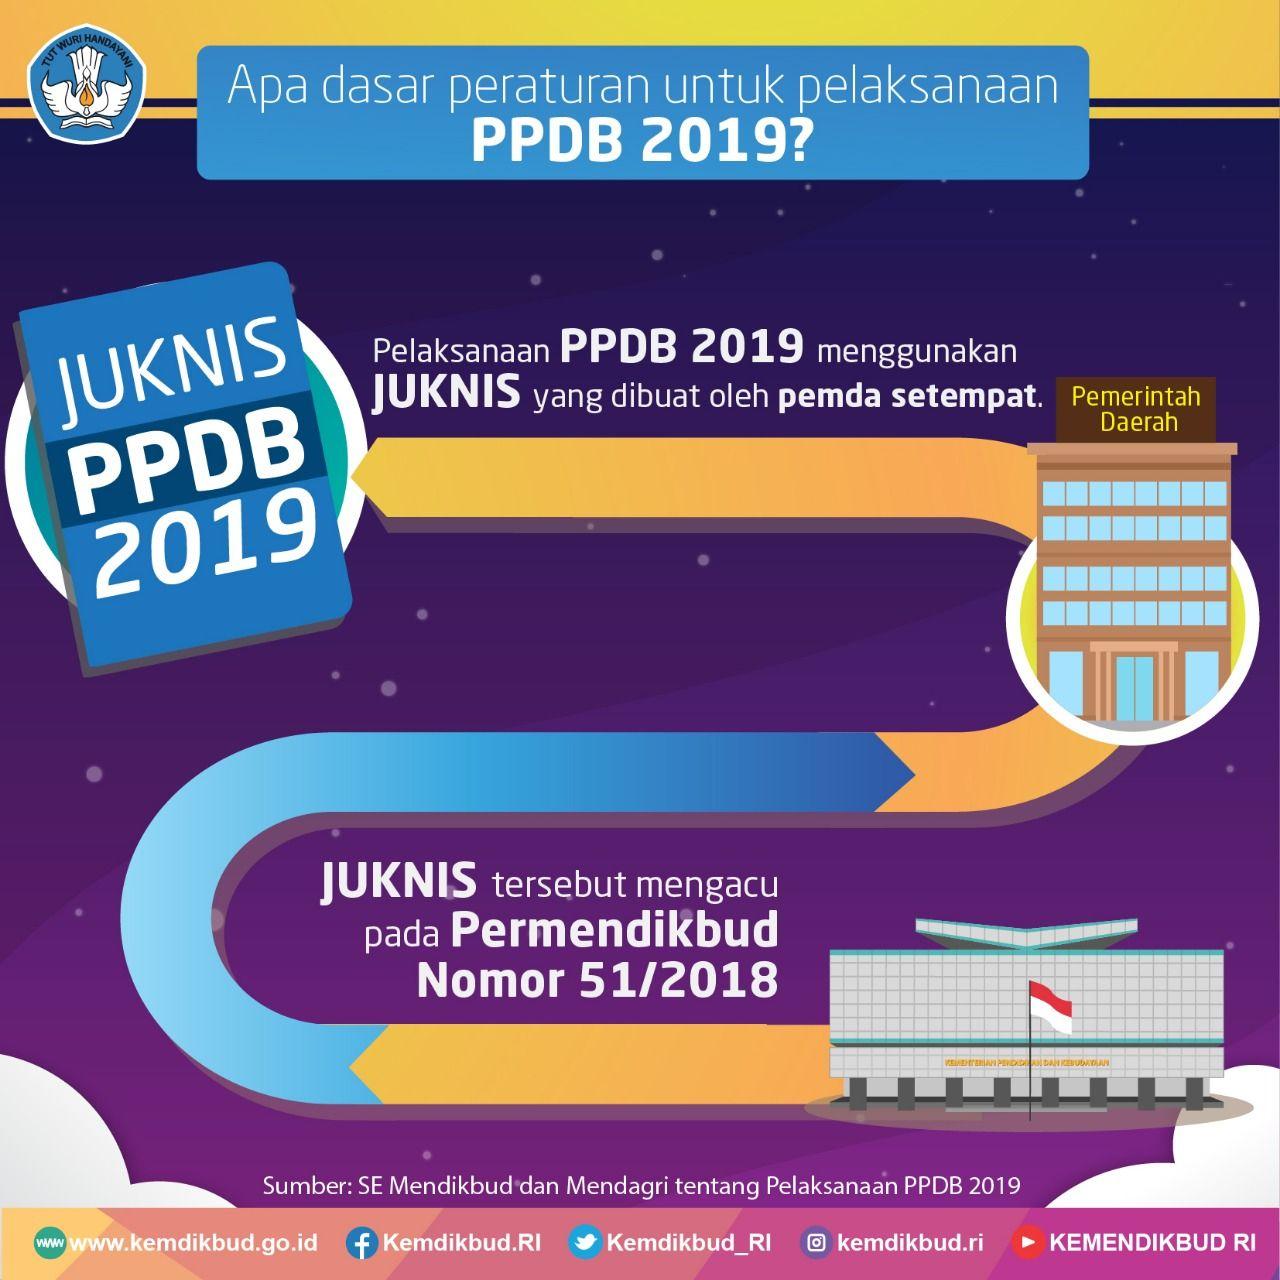 Tiga Jalur Ppdb 2019: Zonasi, Prestasi, Perpindahan Orang Tua